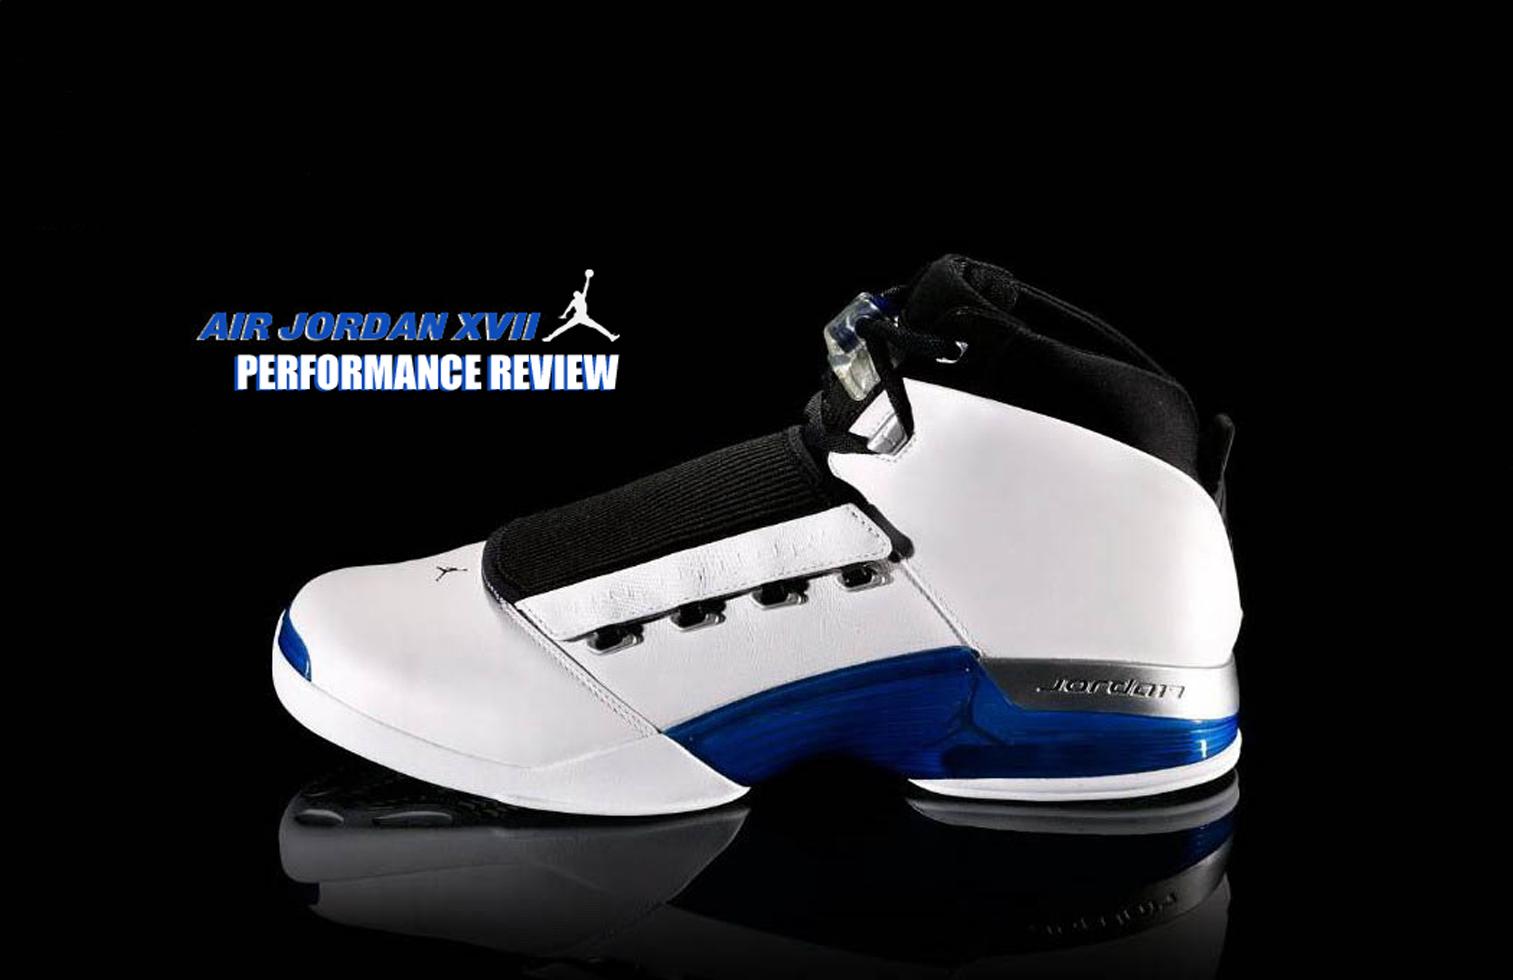 best loved 81871 5e15a Air Jordan Project – Air Jordan XVII (17) Retro Performance Review ...